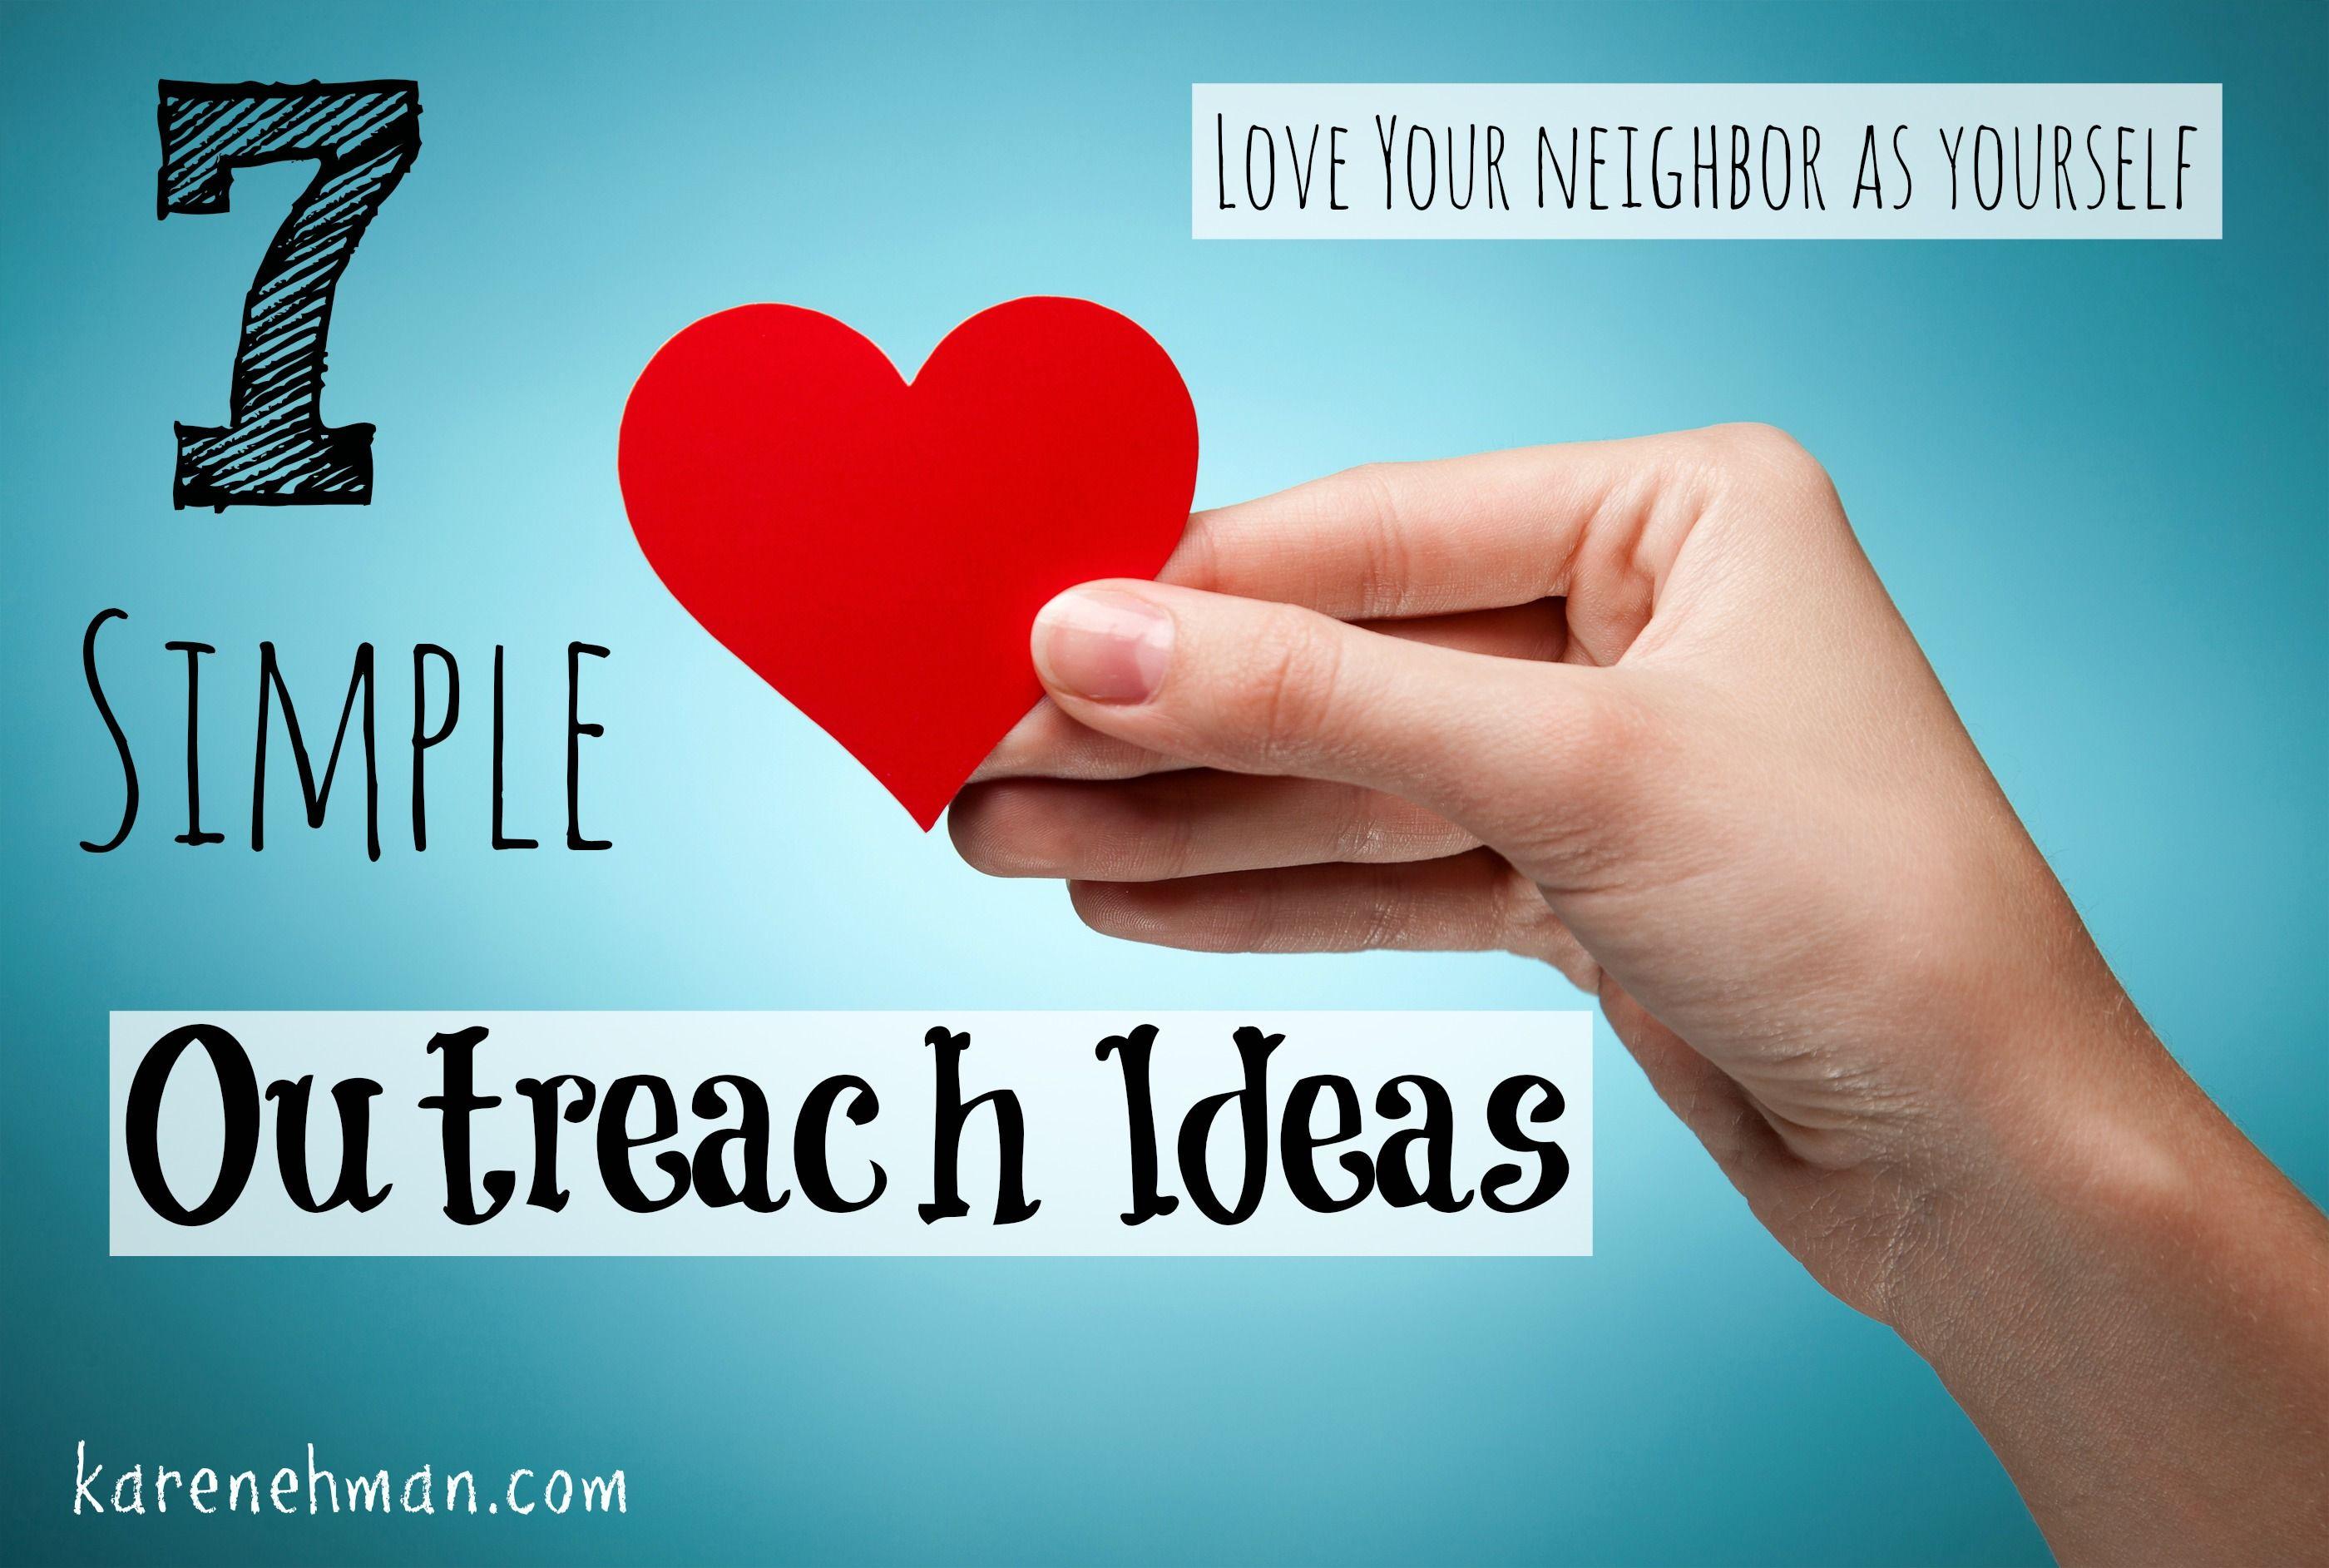 7 simple outreach ideas | outreach | pinterest | church outreach